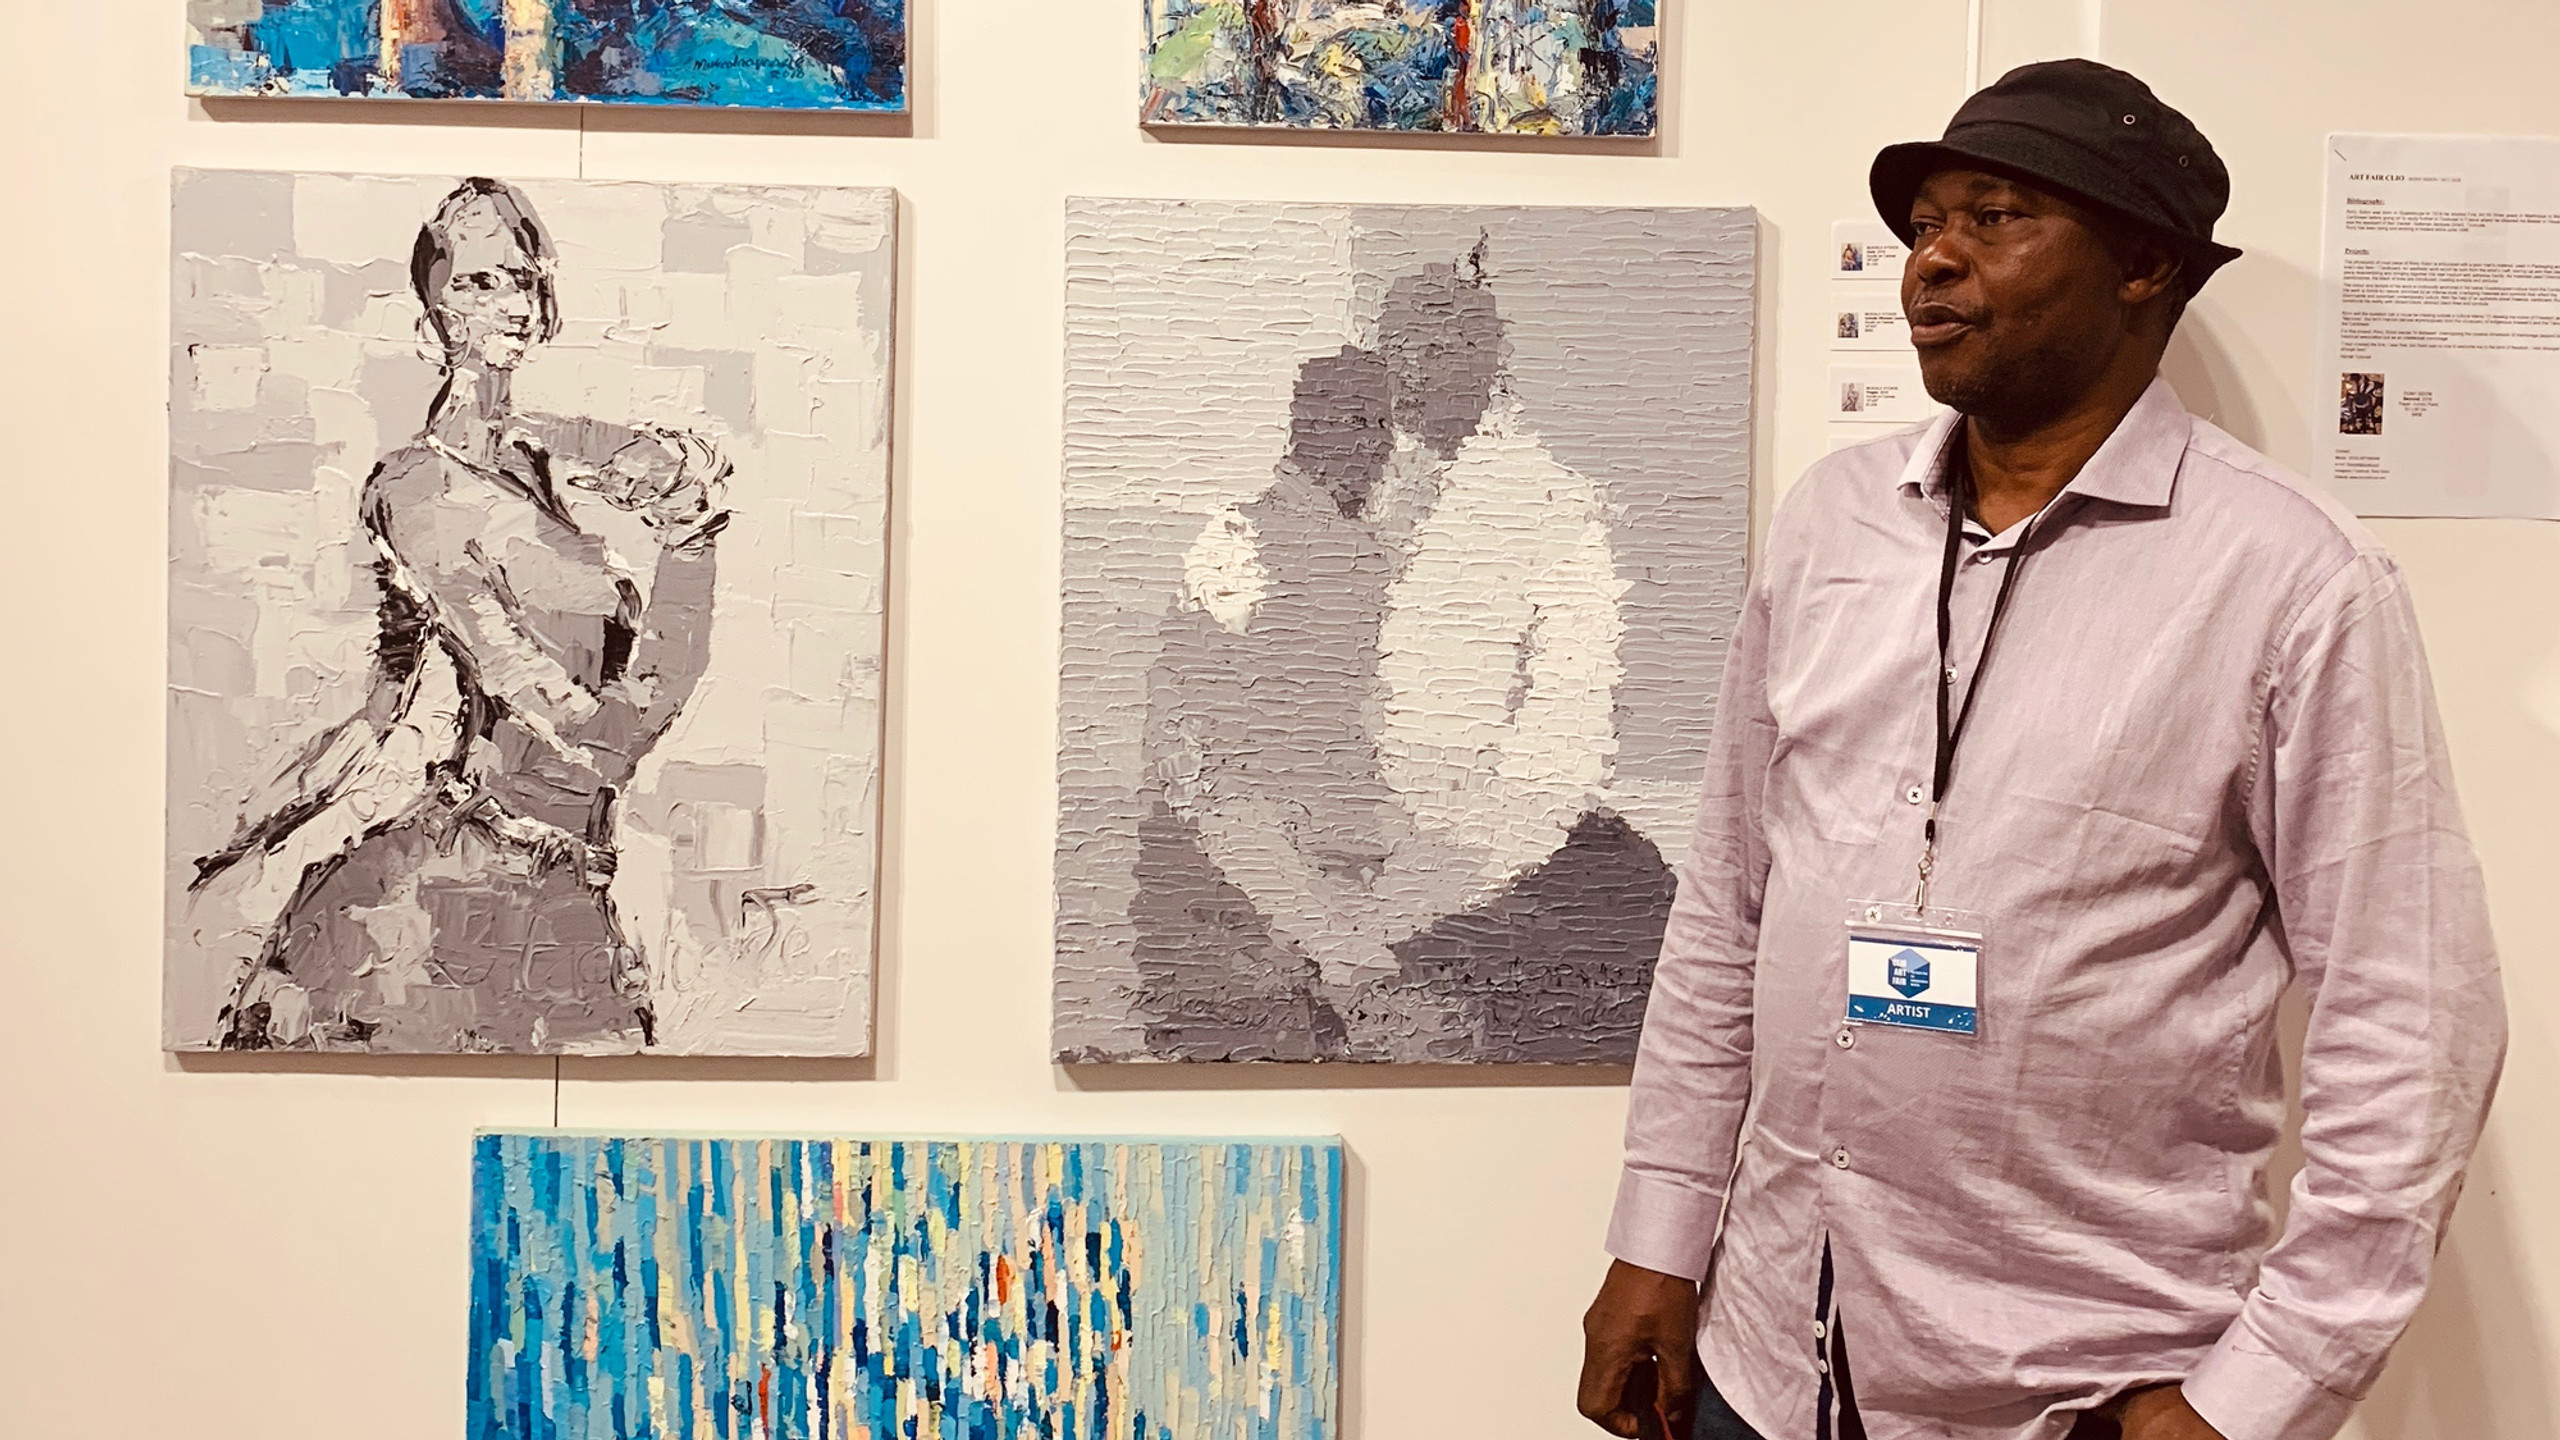 Artist Mukalia Ayoade